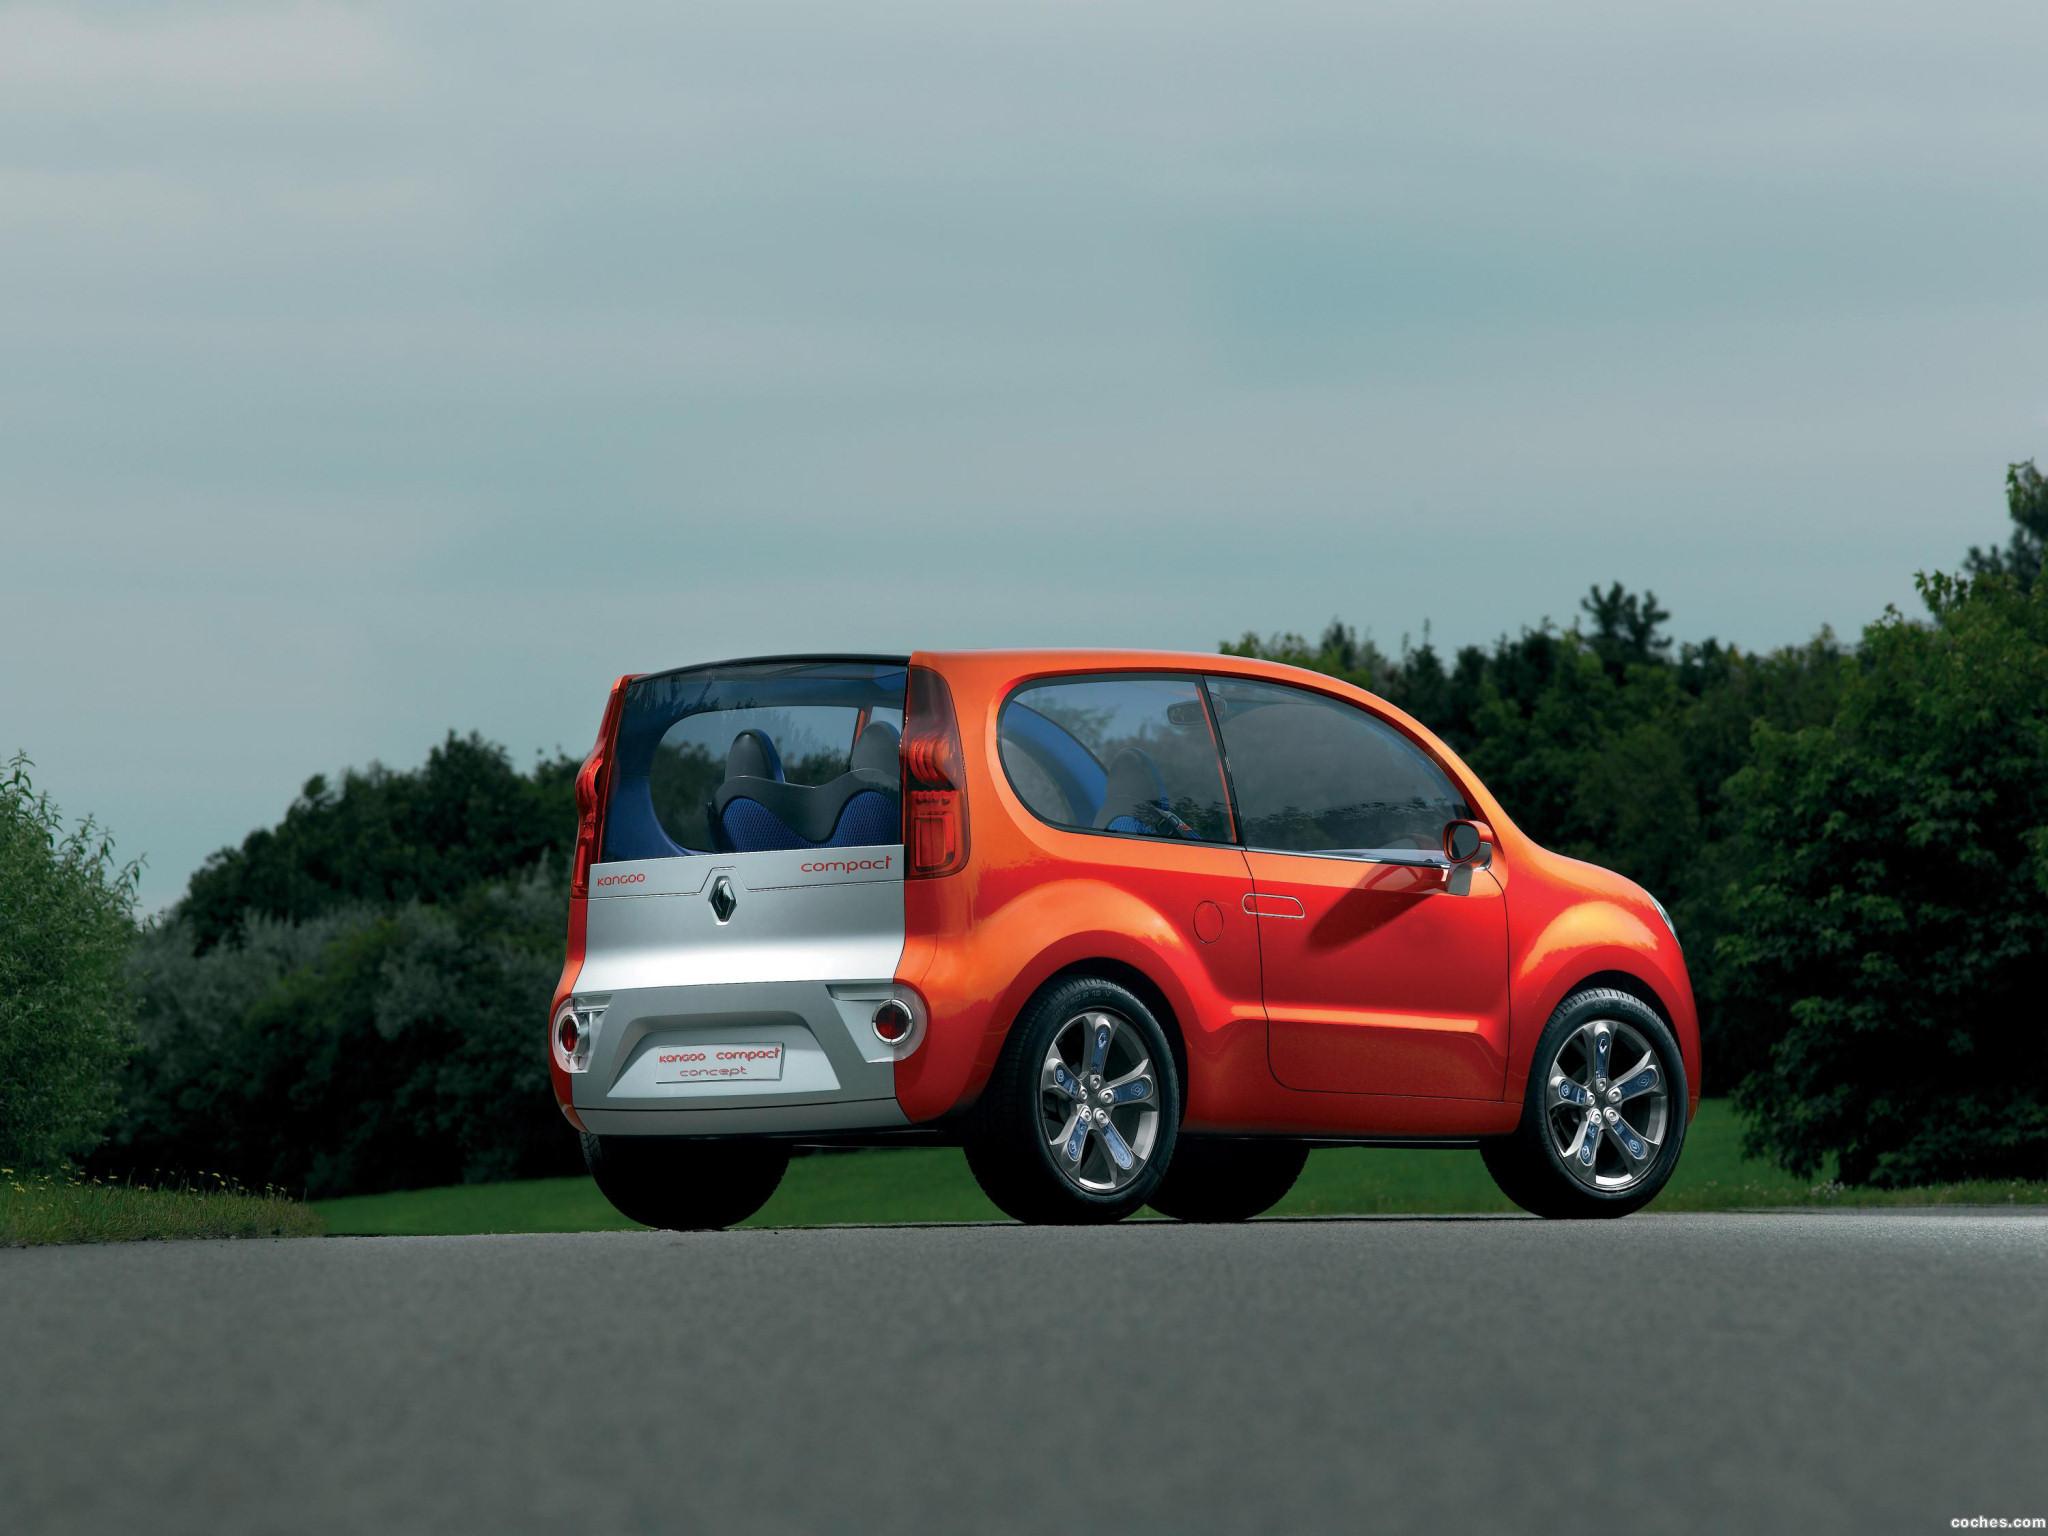 Foto 2 de Renault Kangoo Compact Concept 2007